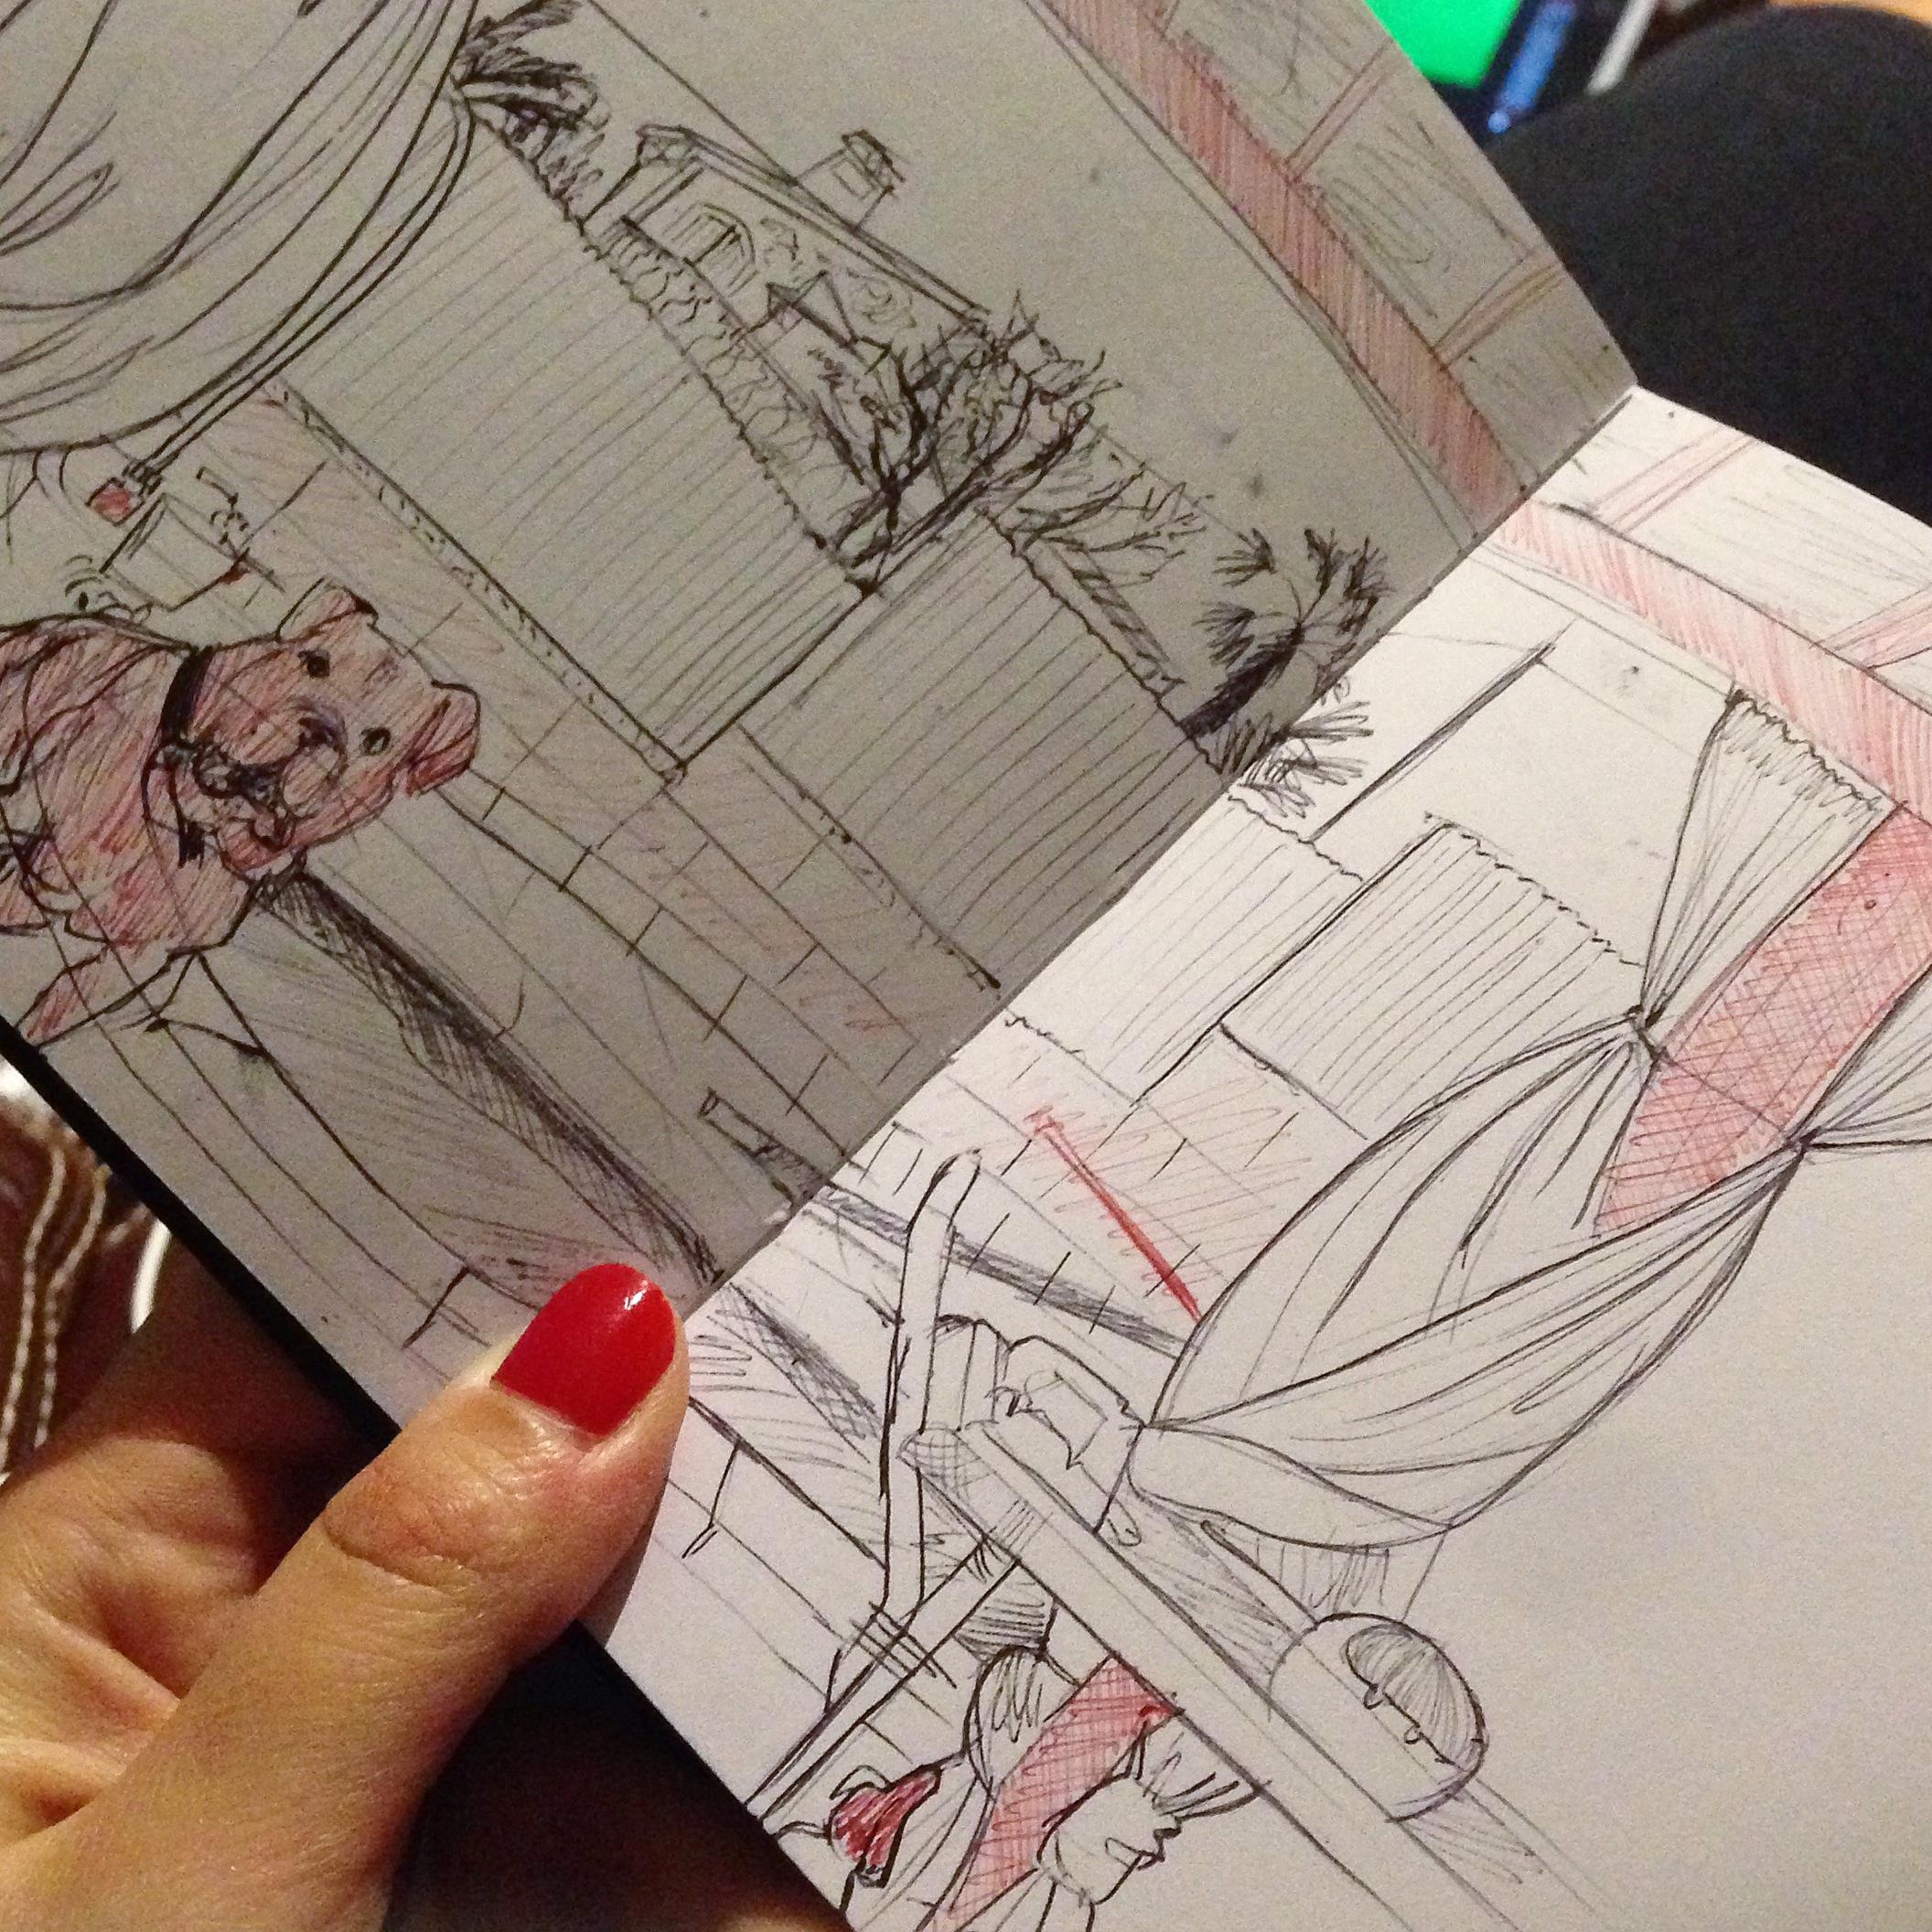 sketchbook sketch boceto cuaderno dibujo doodle garabato urban sketcher mallorca family landscape Bud dog Santa Ponça casa home